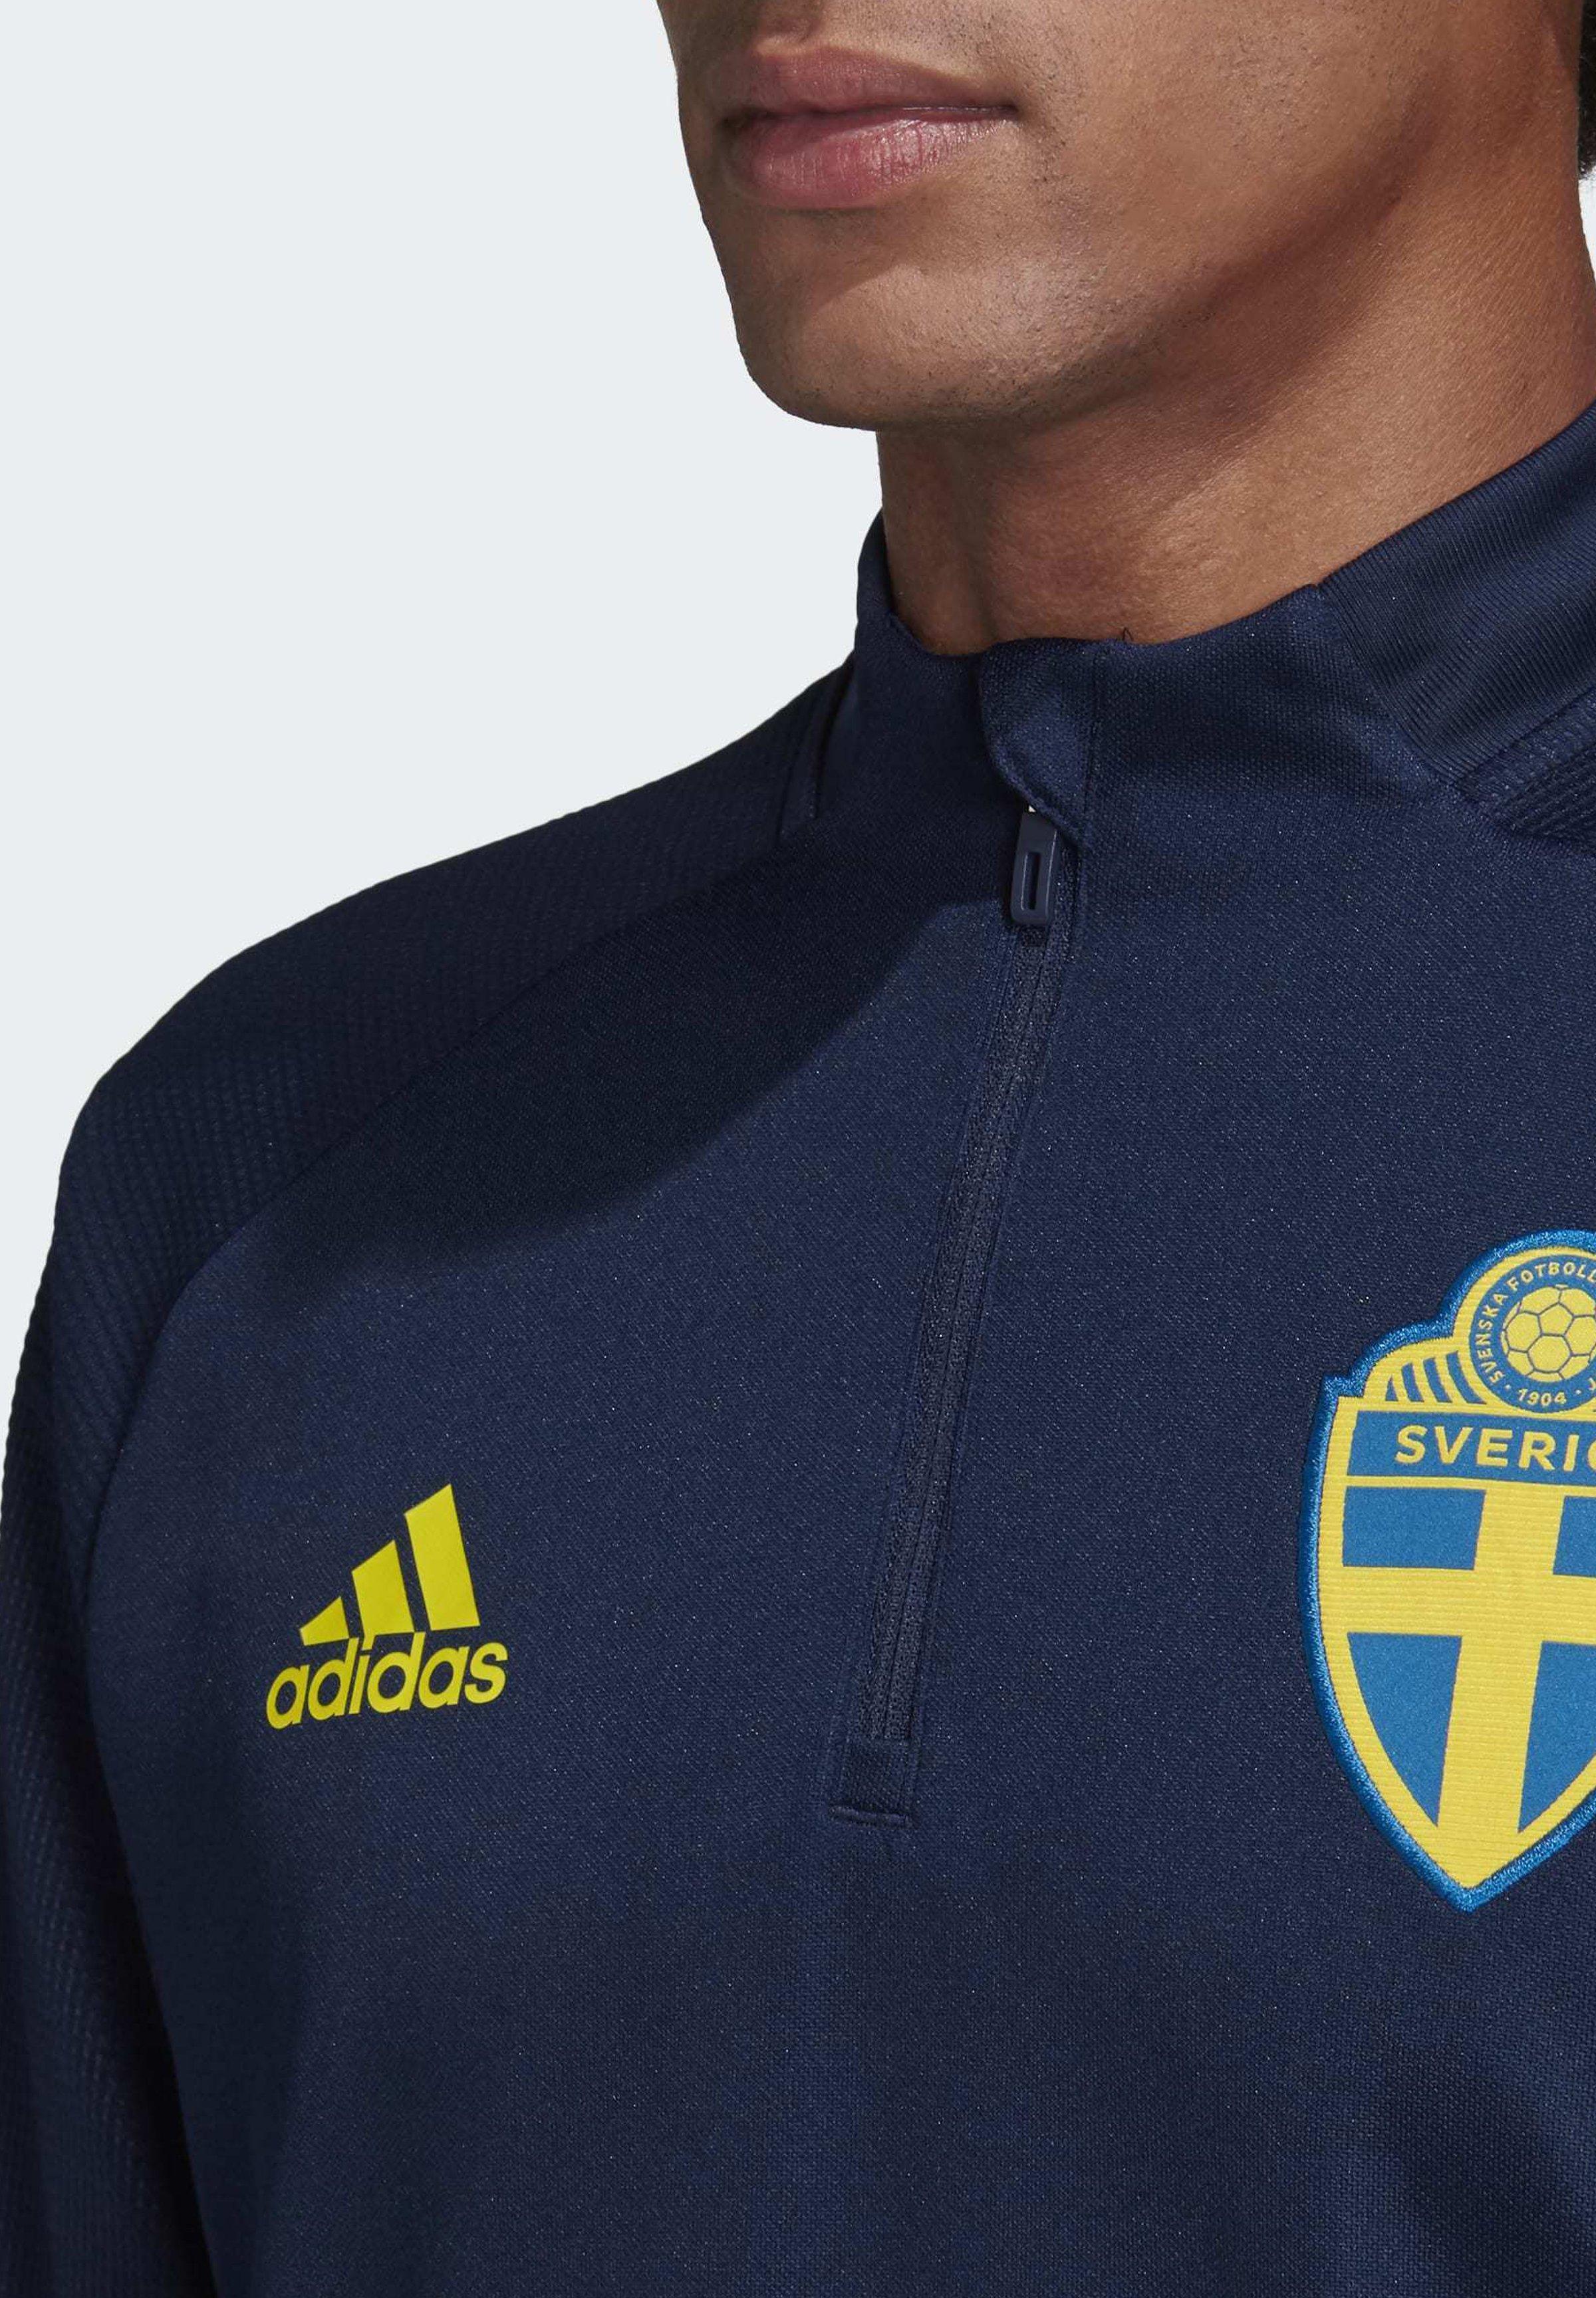 Schweden Hoodie Sweatjacke Adidas SVFF Navy